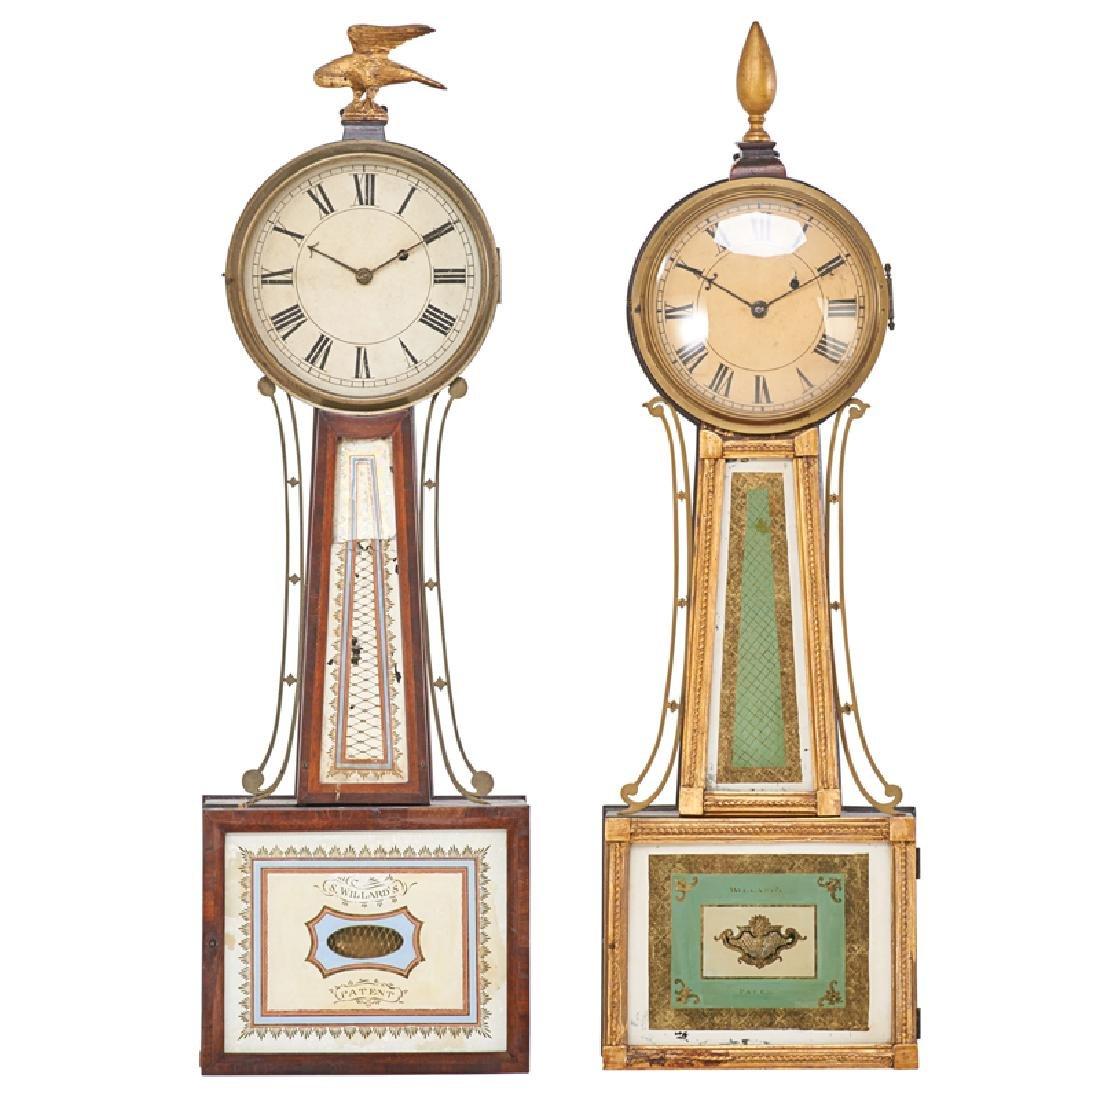 TWO SIMON WILLARD BANJO CLOCKS